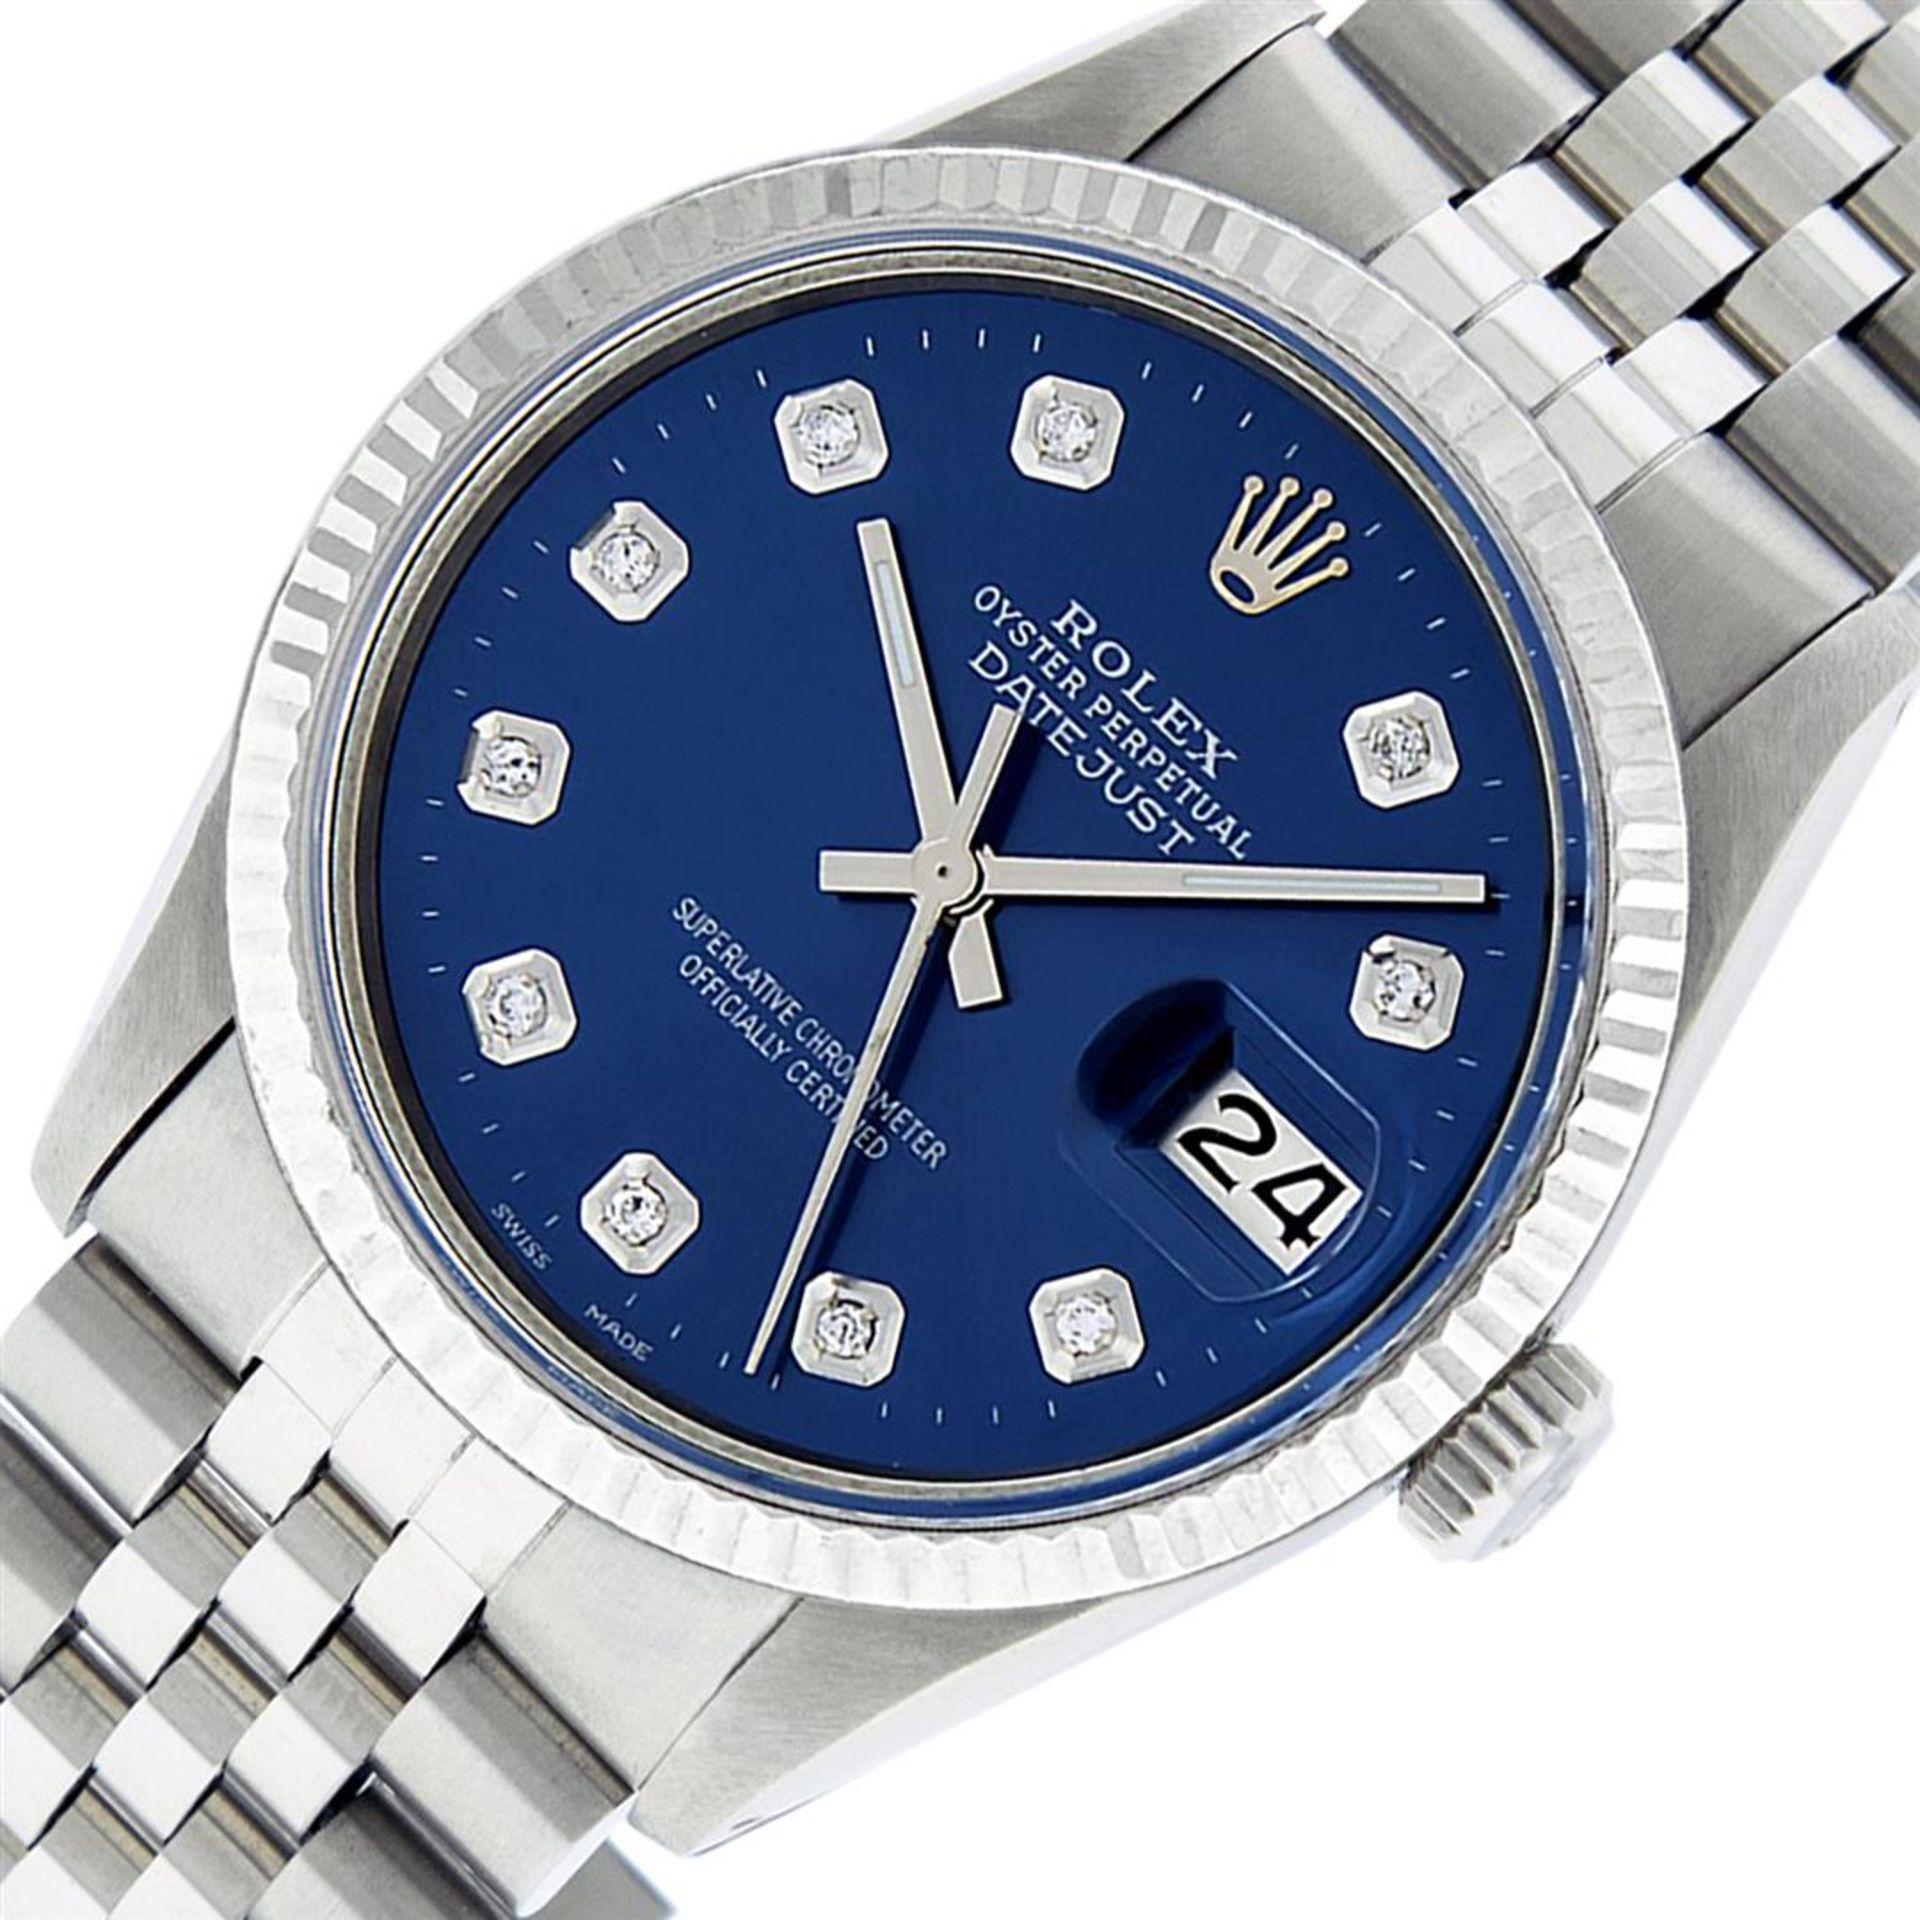 Rolex Mens Stainless Steel 36MM Blue Diamond Datejust Wristwatch - Image 2 of 9